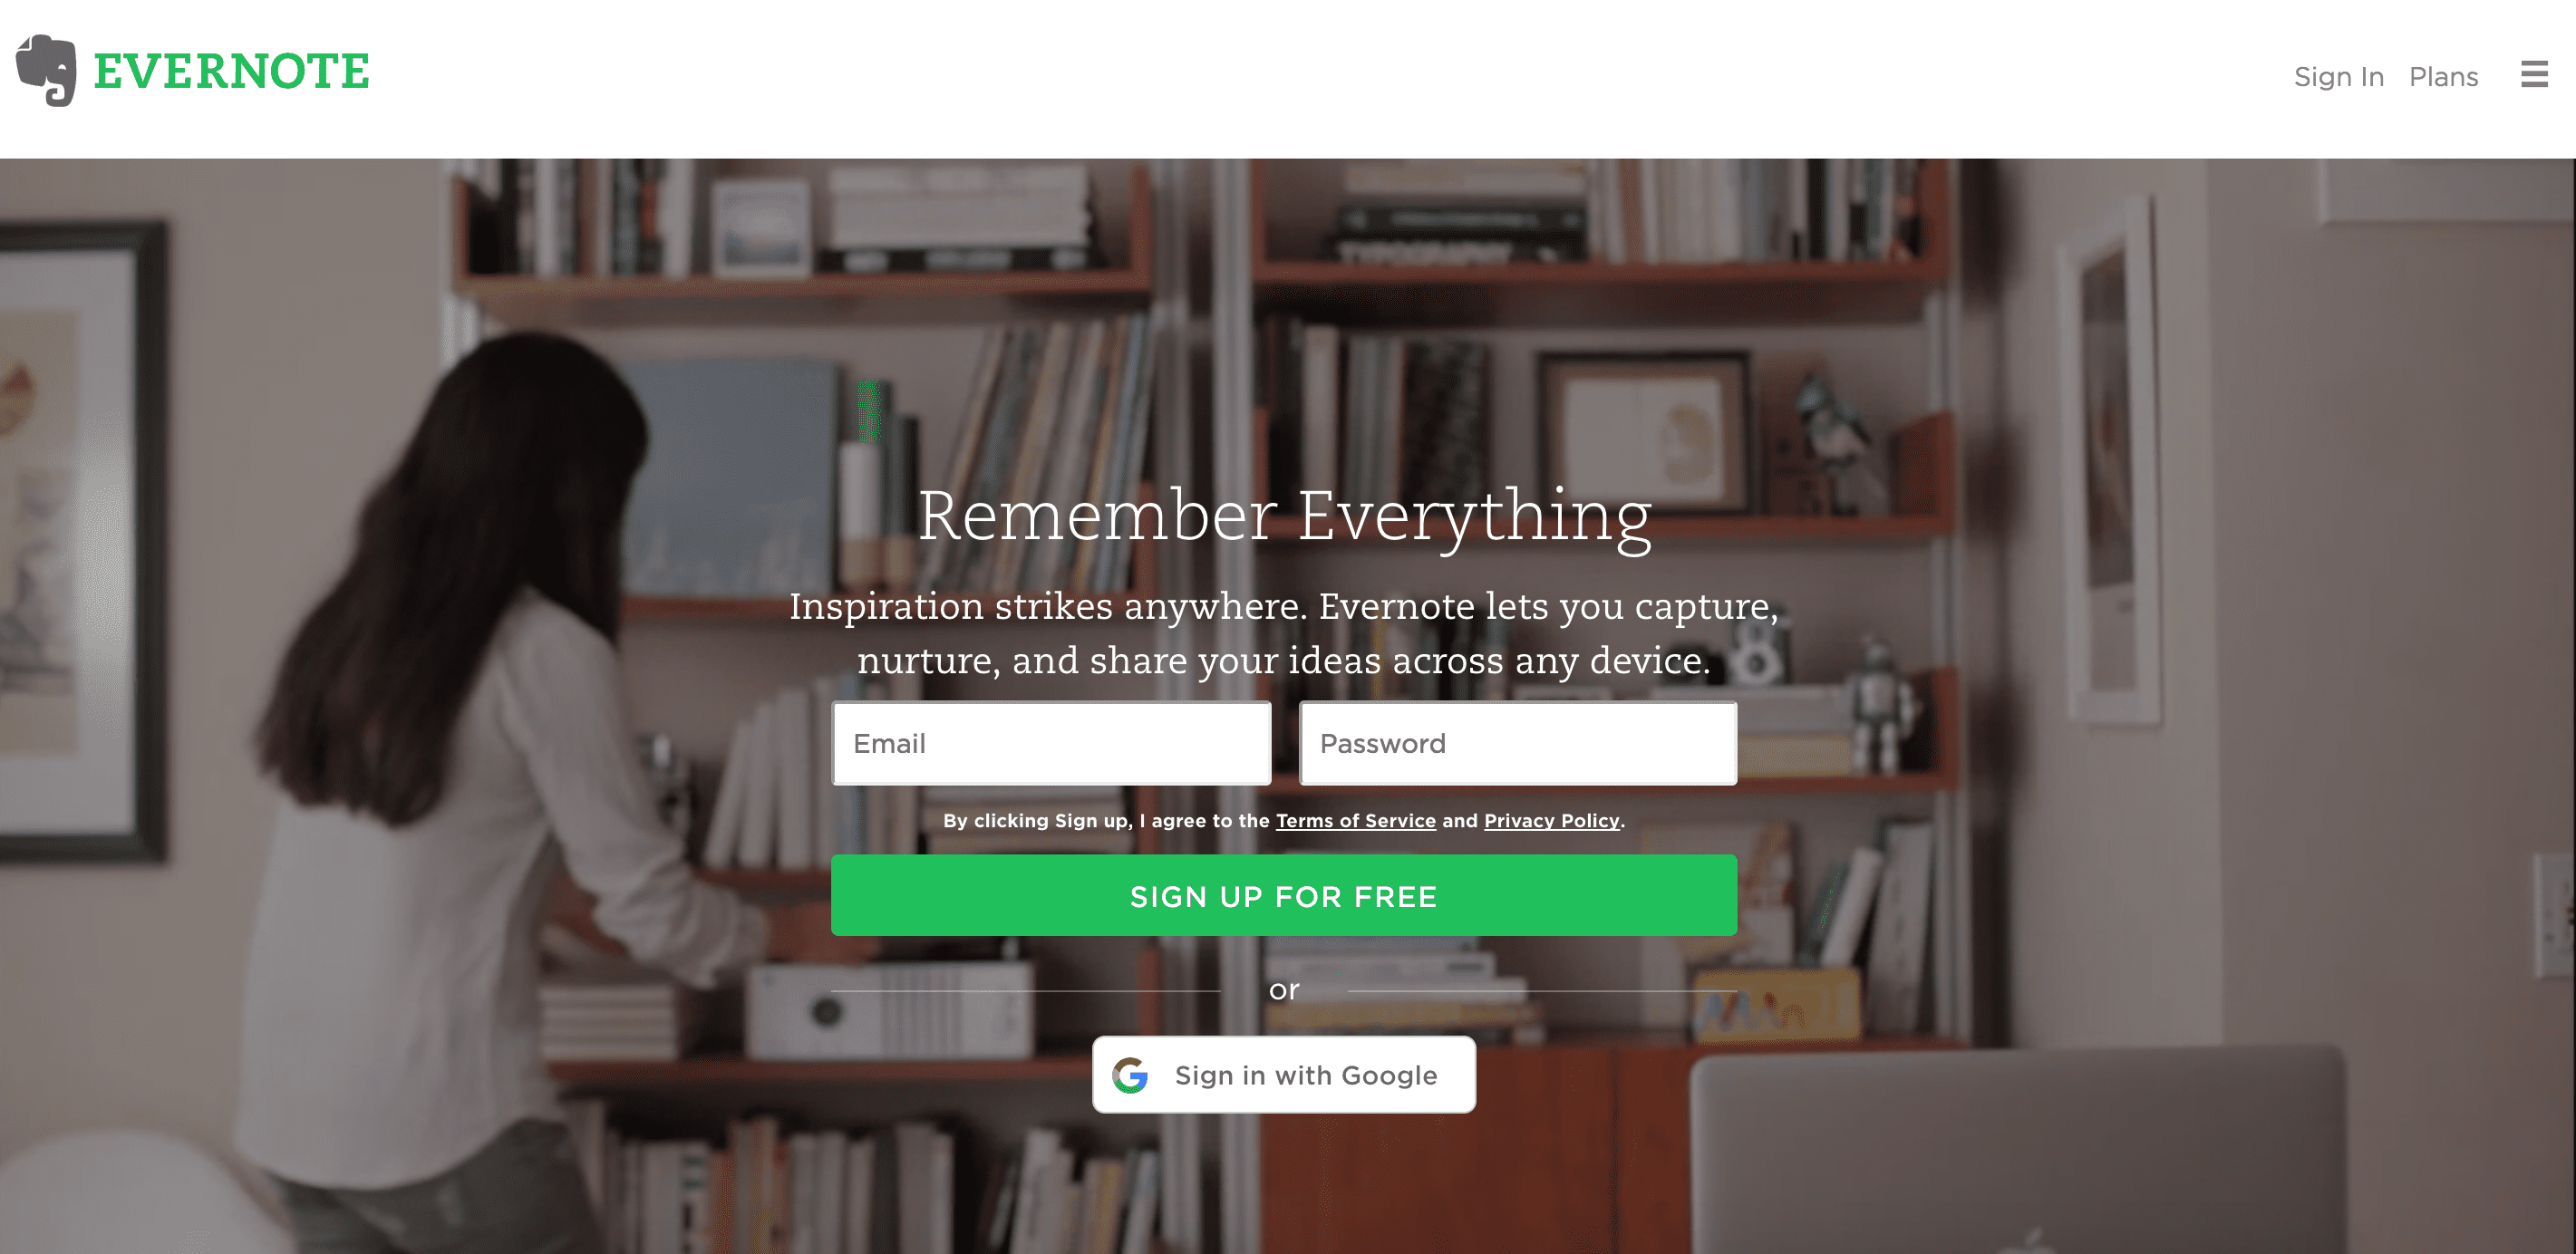 Evernote website